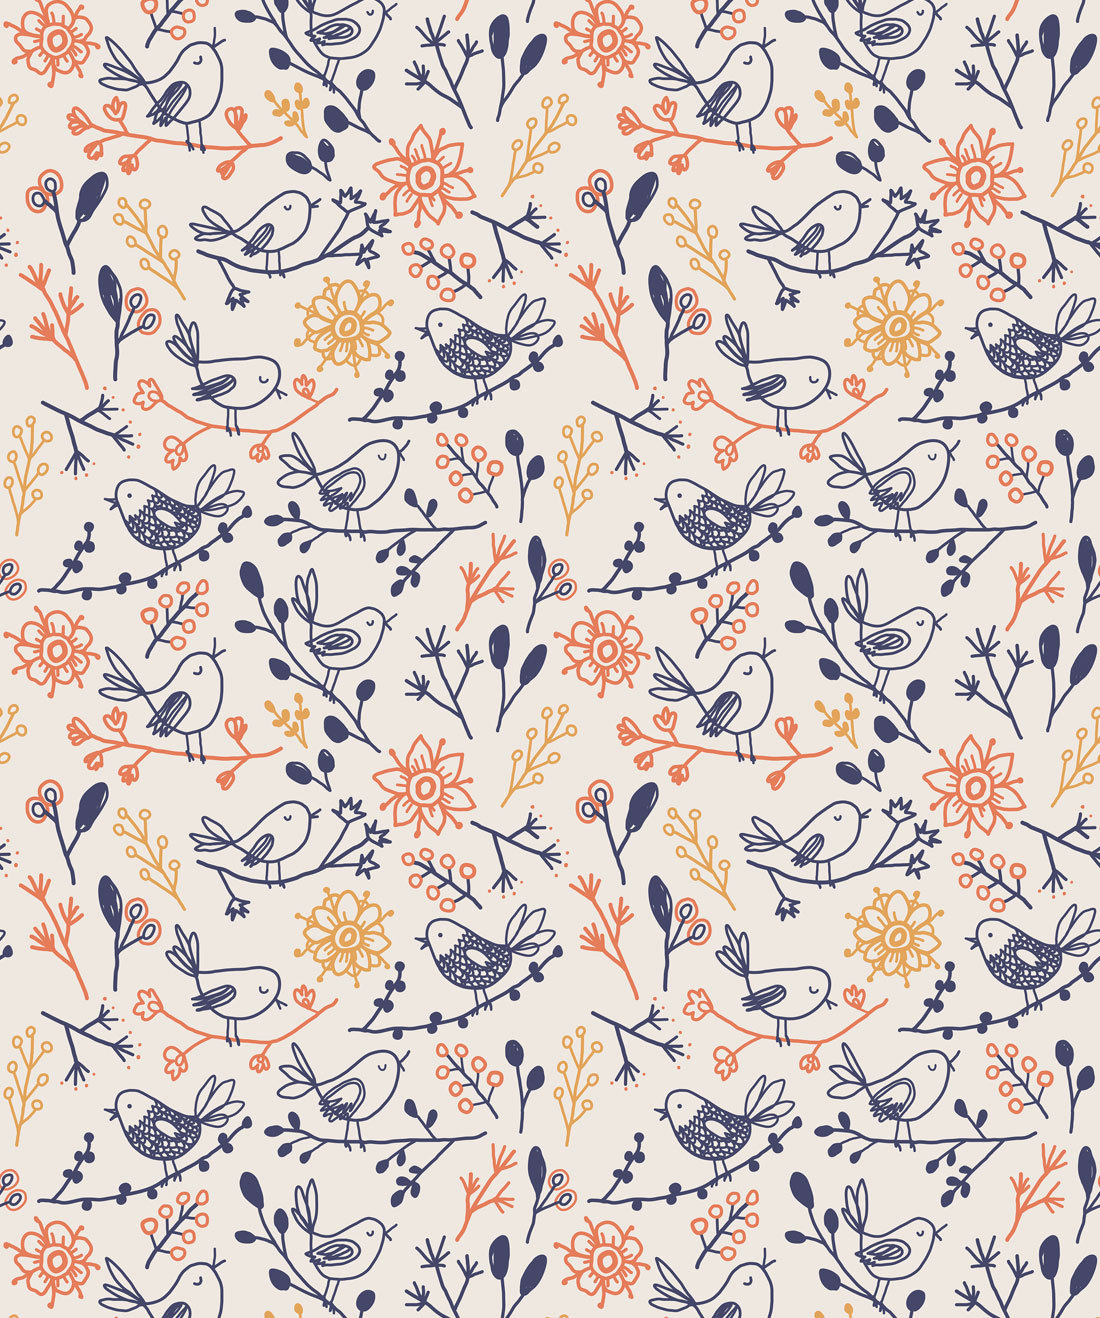 Wawani Birds Wallpaper